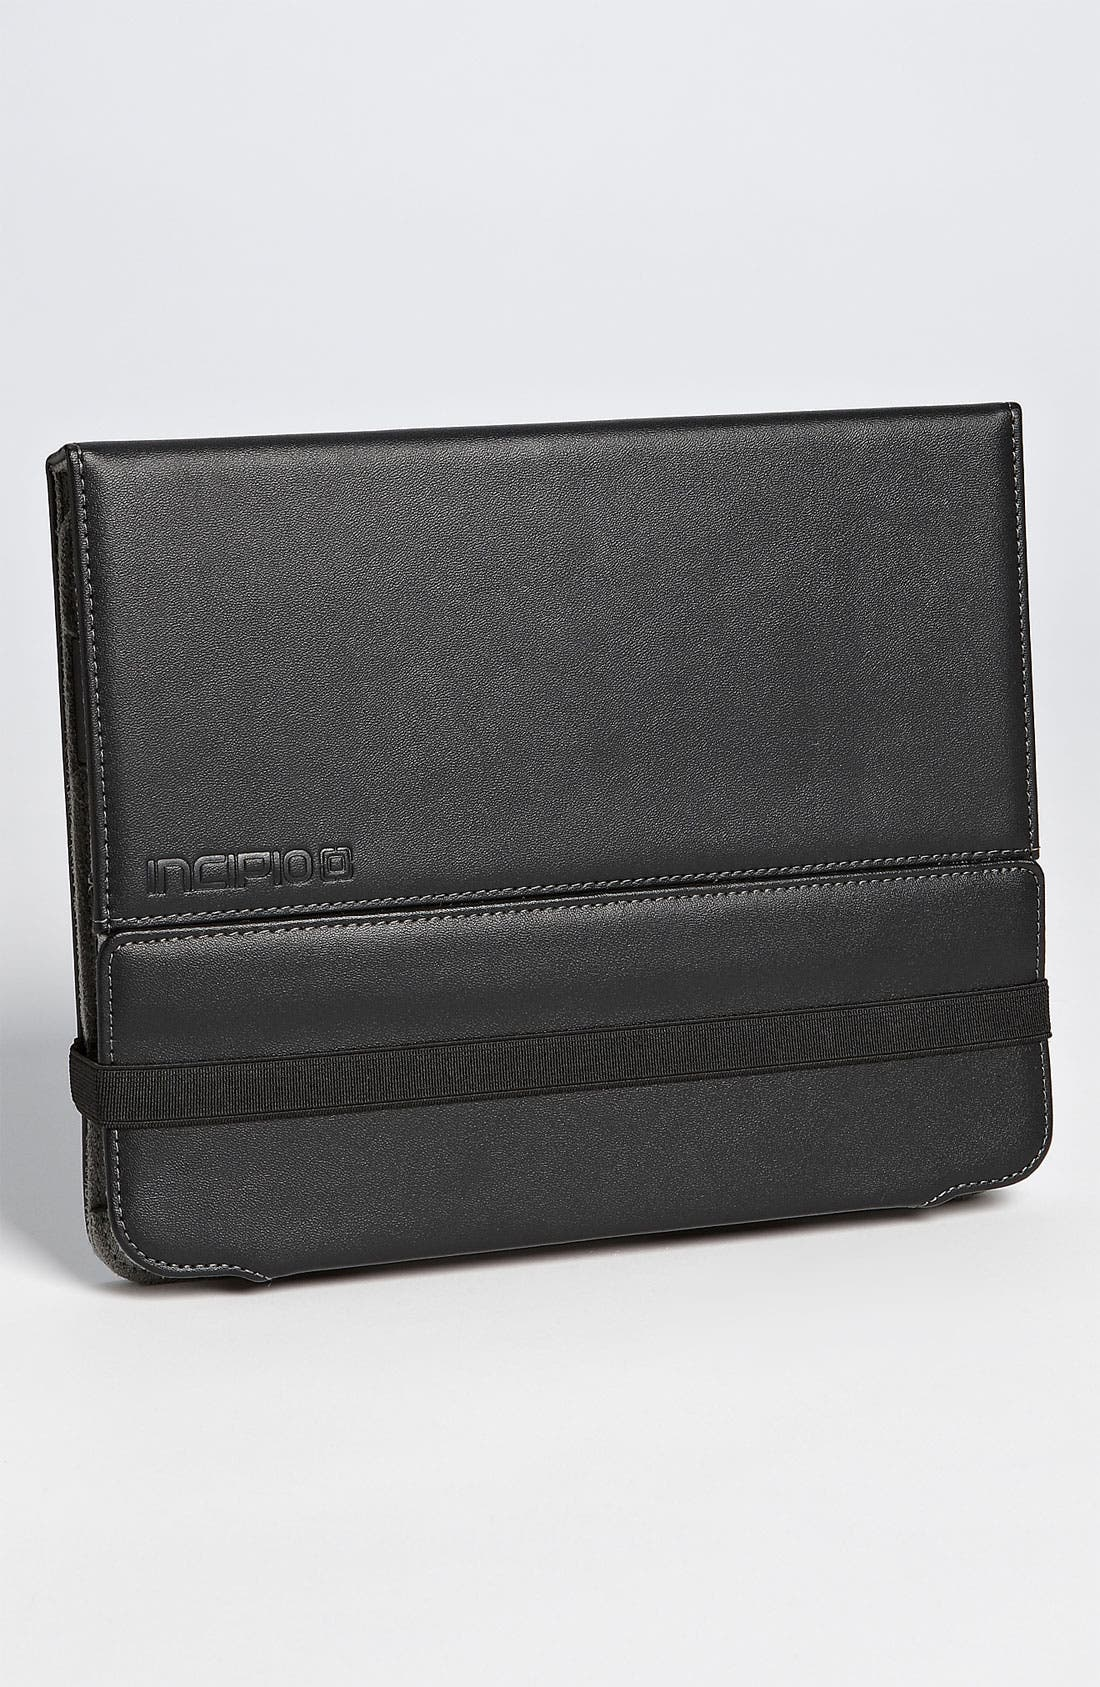 Main Image - Incipio 'Executive Premium Kickstand' iPad 2 Case